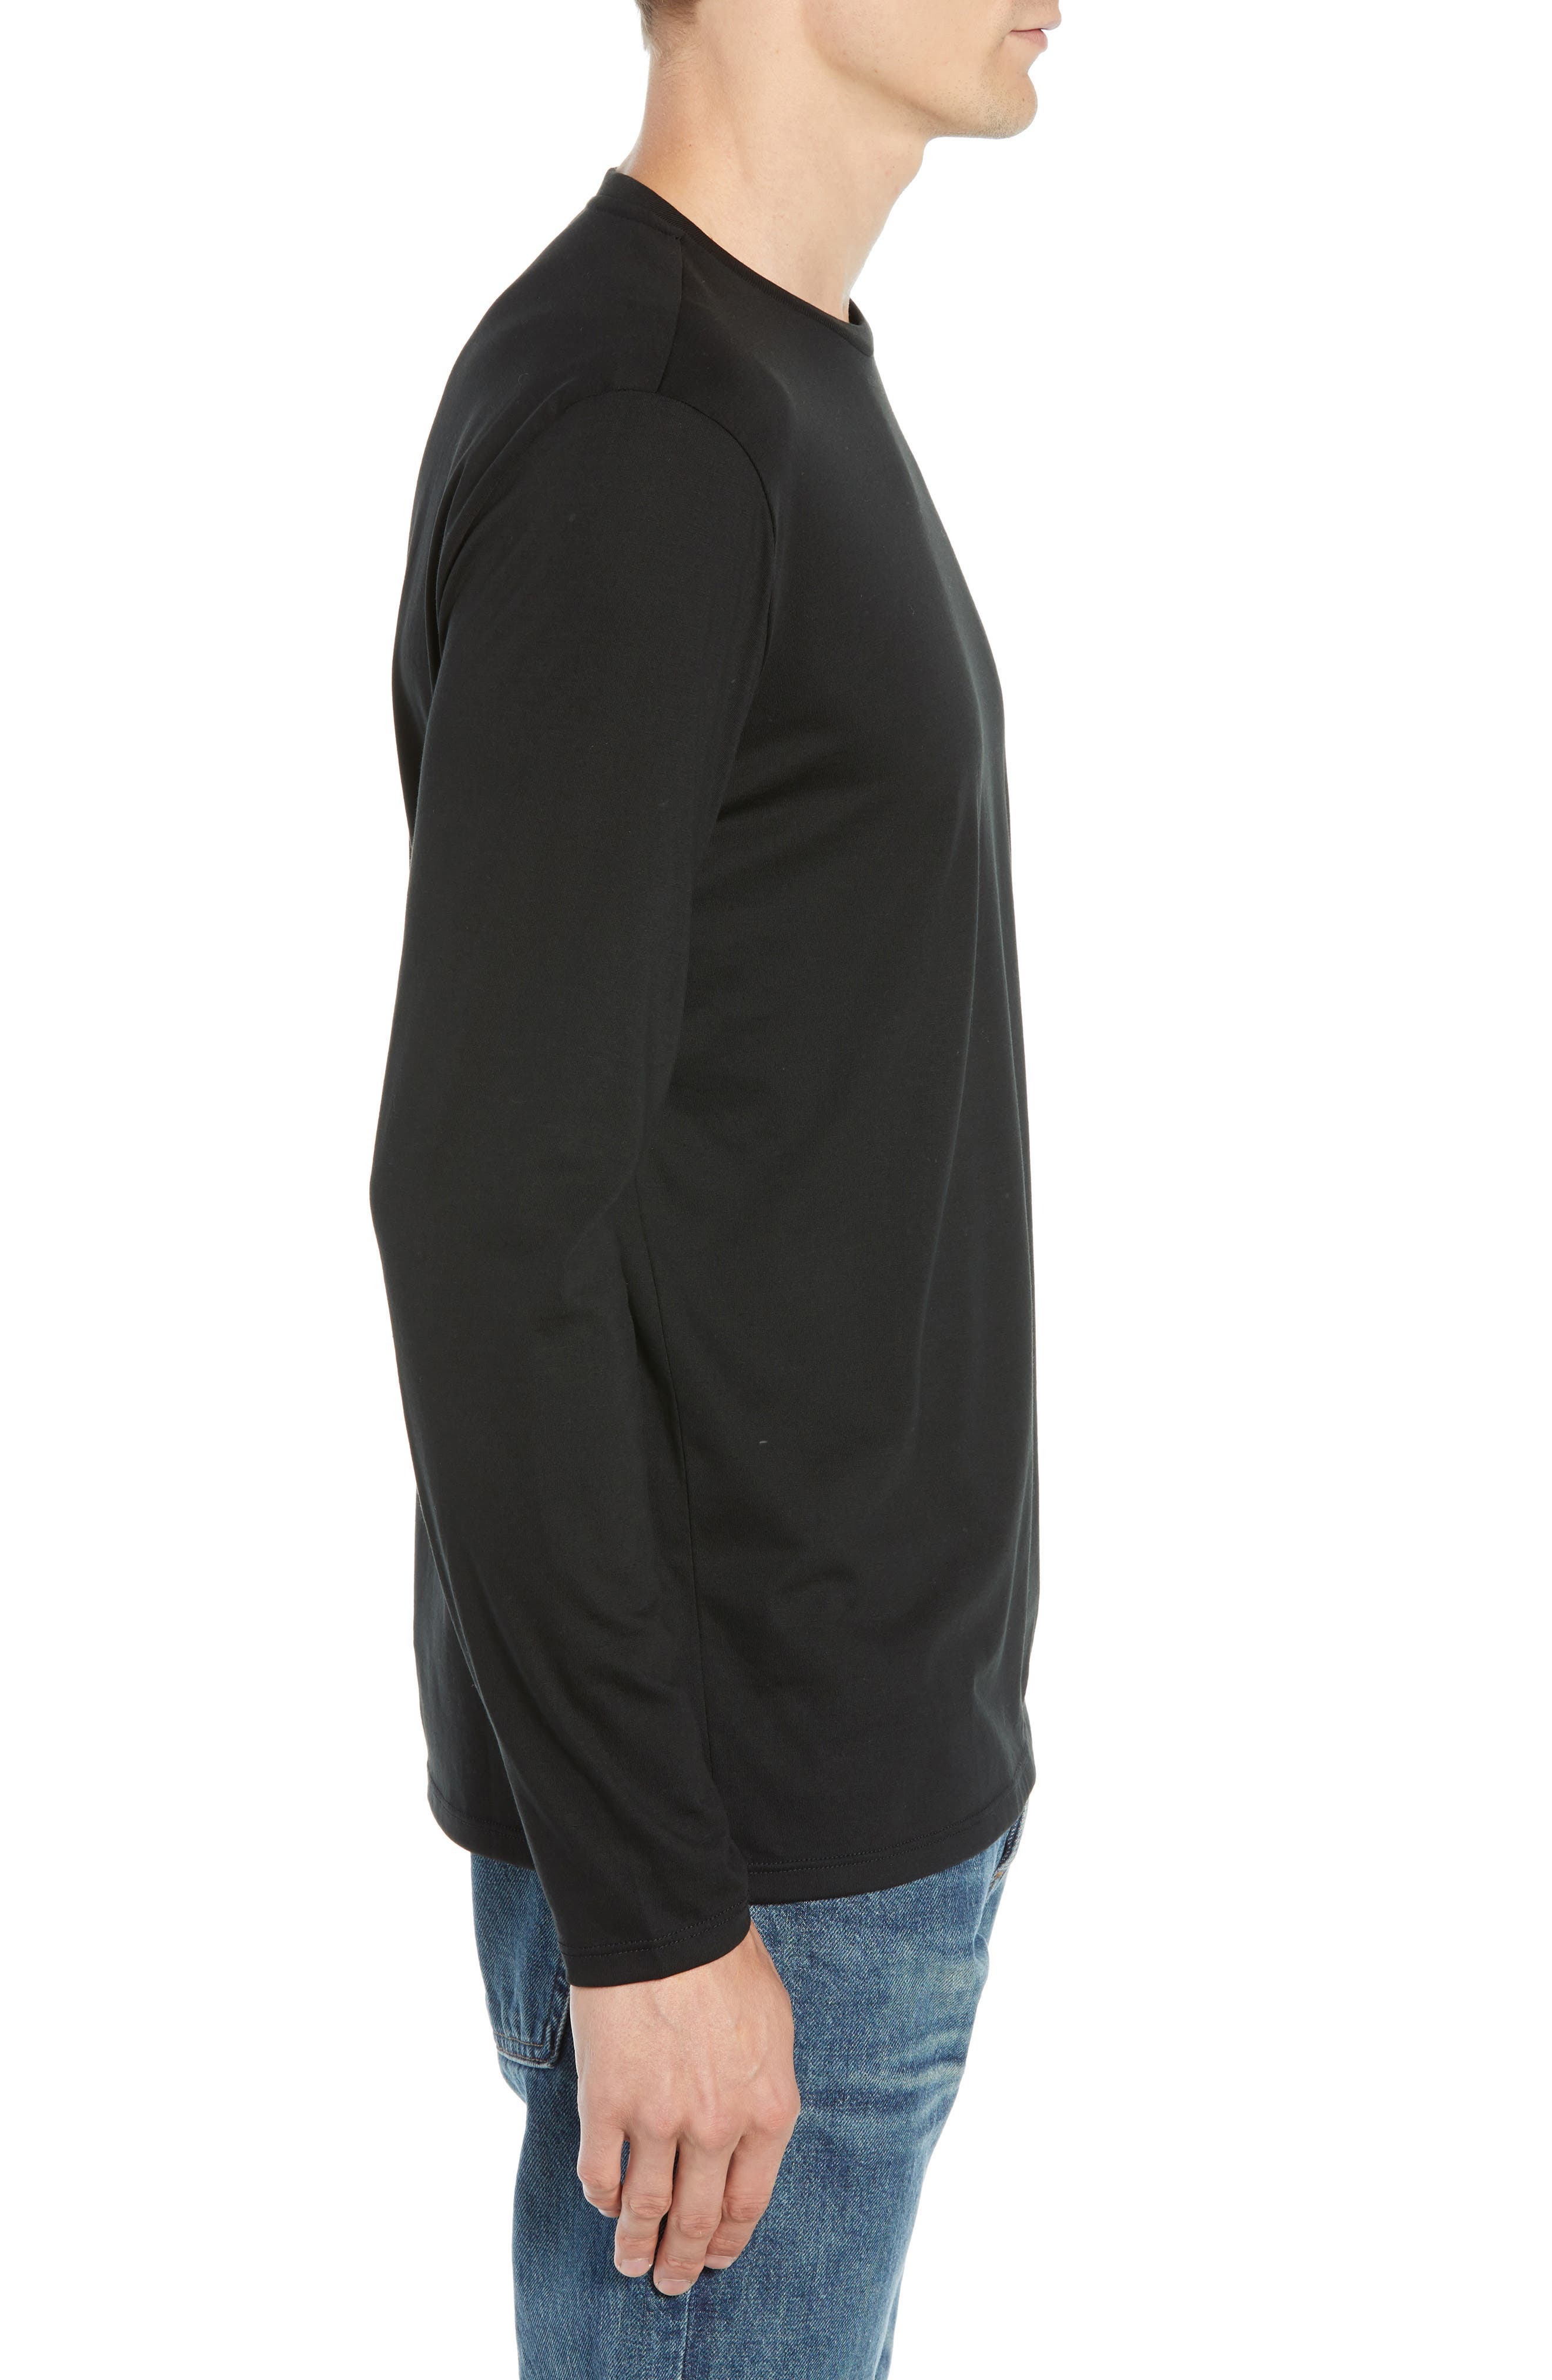 LACOSTE, Long Sleeve Pima Cotton T-Shirt, Alternate thumbnail 3, color, BLACK